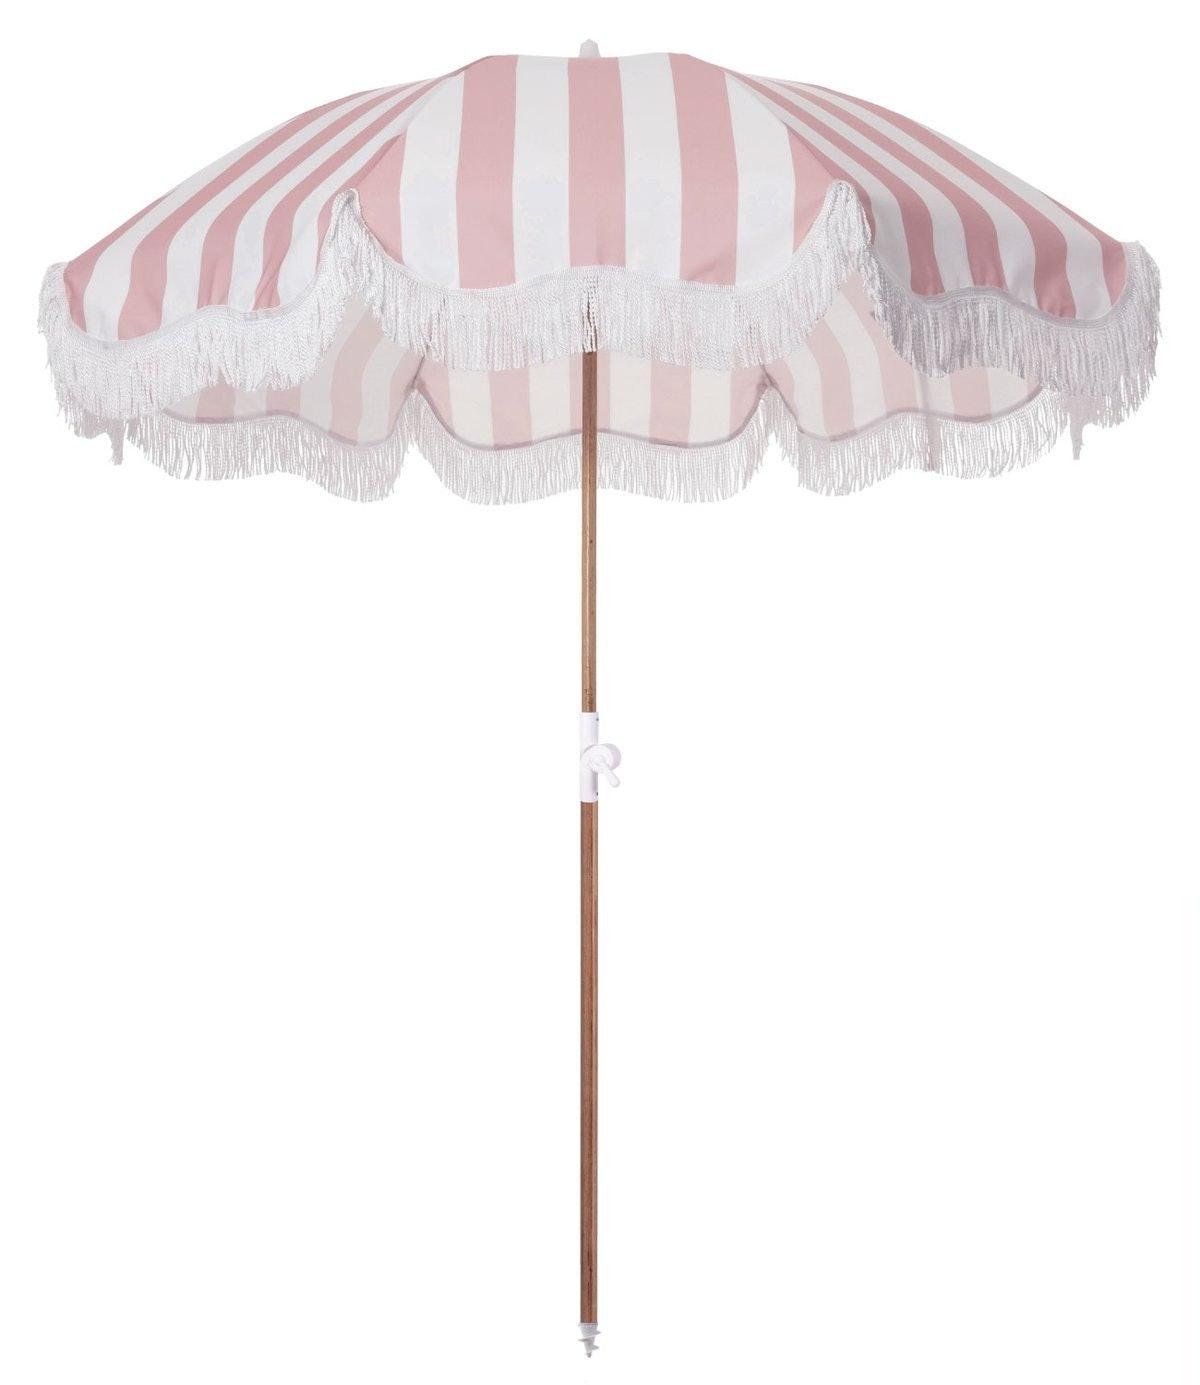 The Holiday Beach Umbrella - Pink Crew Stripe